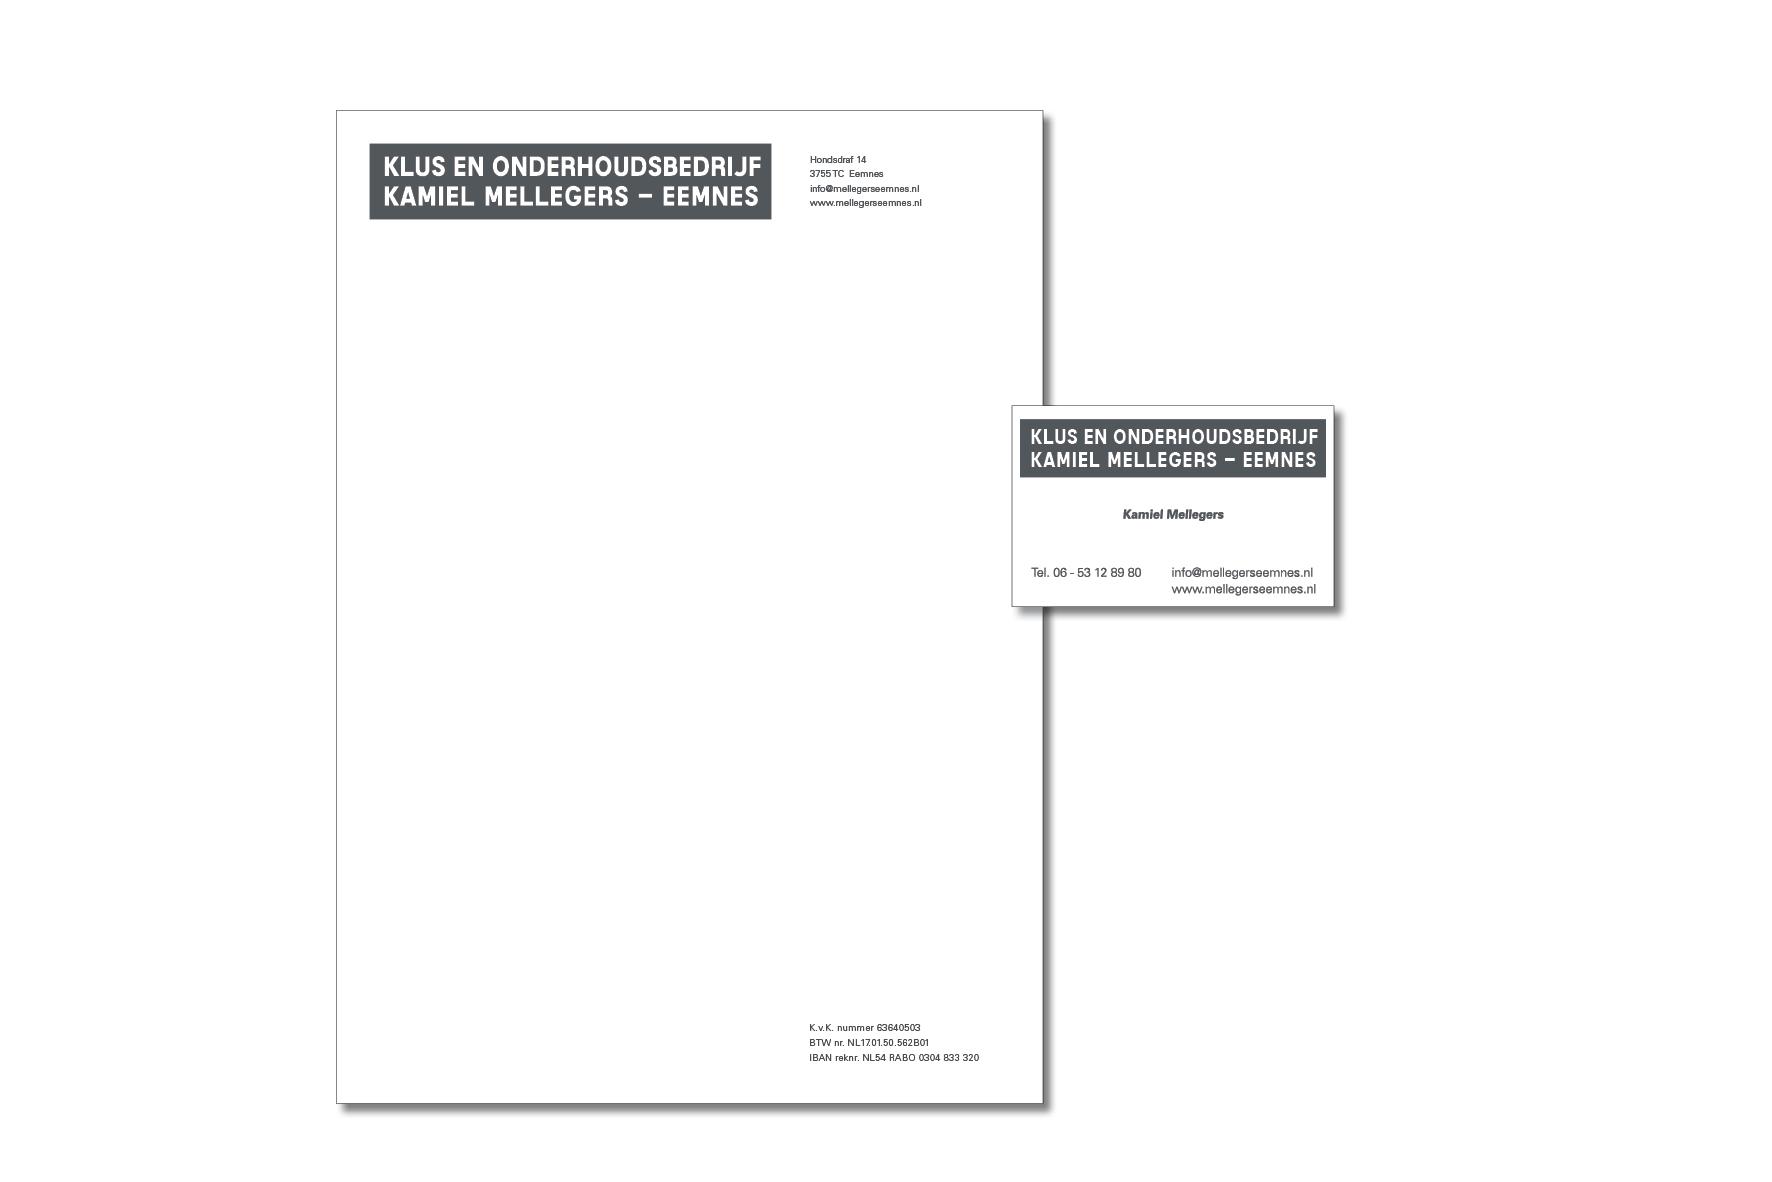 cc grafisch ontwerp_huisstijl mellegers